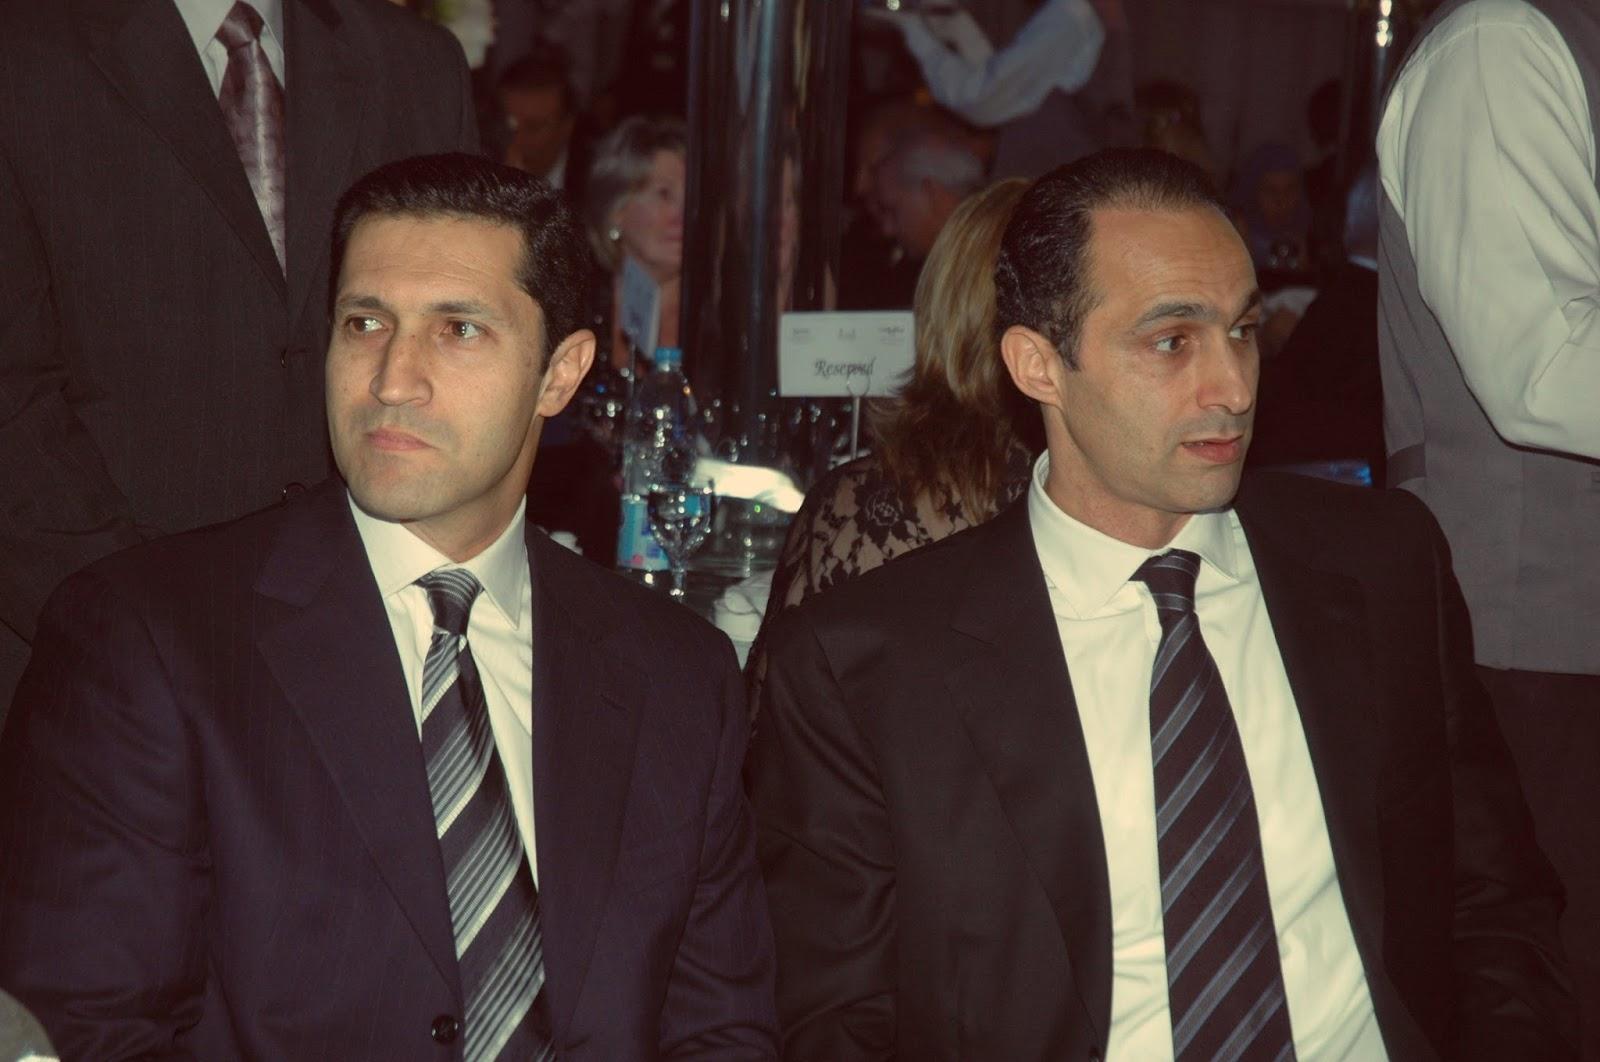 vision magazine hosni mubarak s two sons arrested for stock